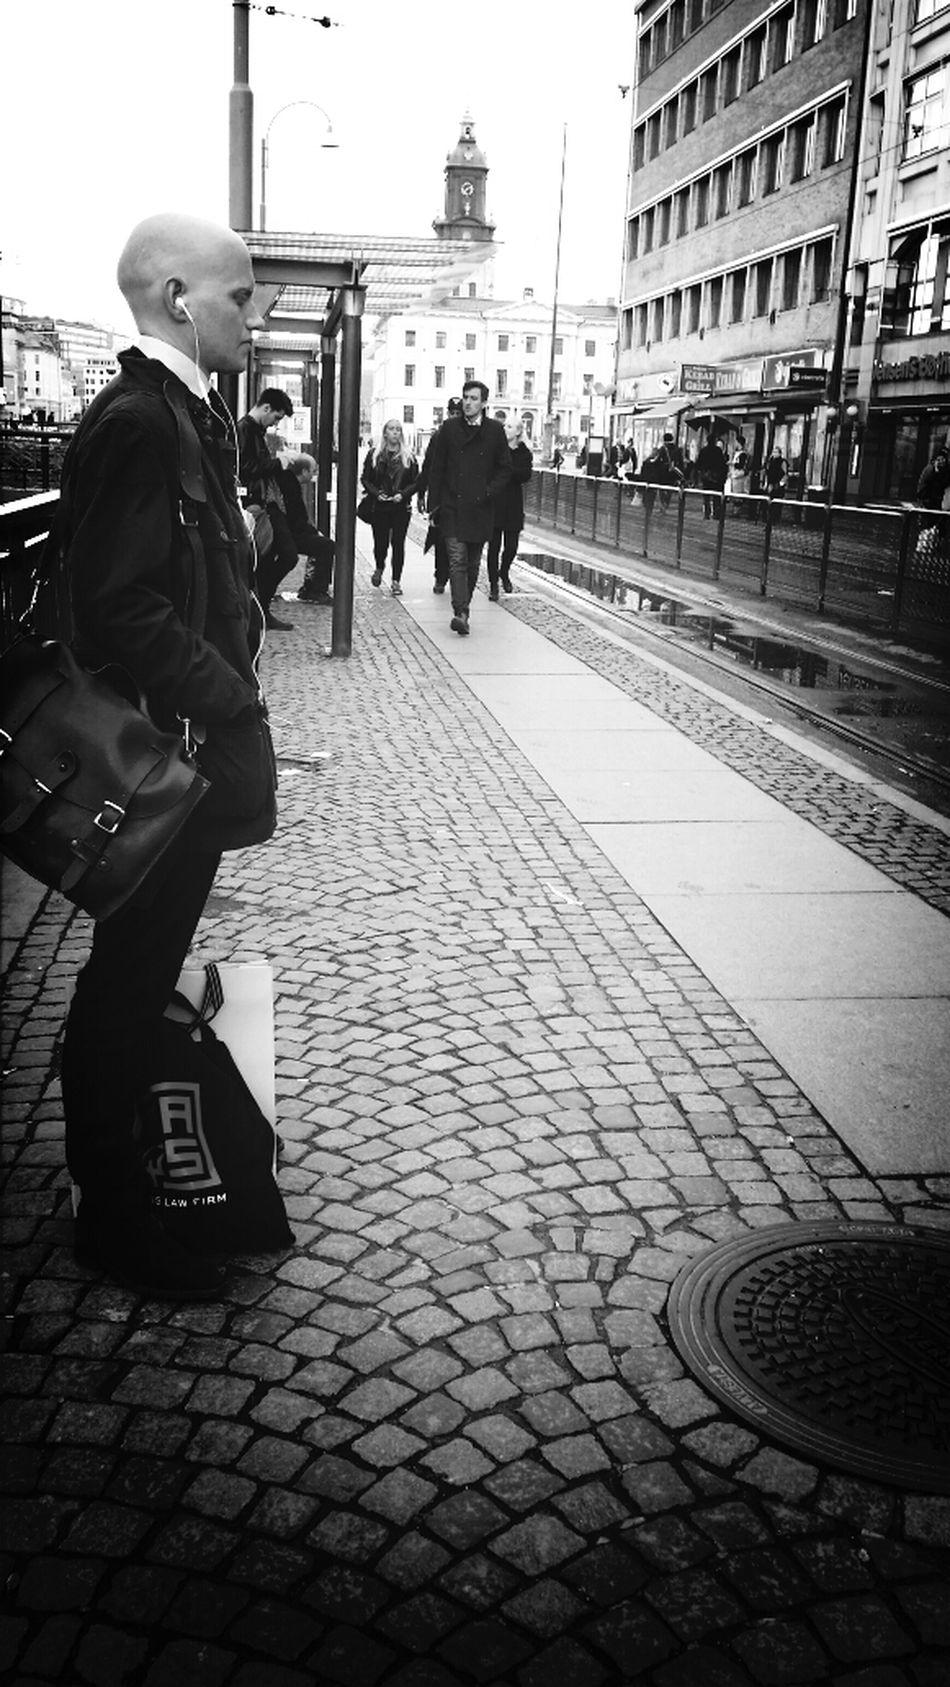 EyeEm Gallery Peoplephotography Streetphoto_bw Gothenburg_bw ....waiting for the tram....